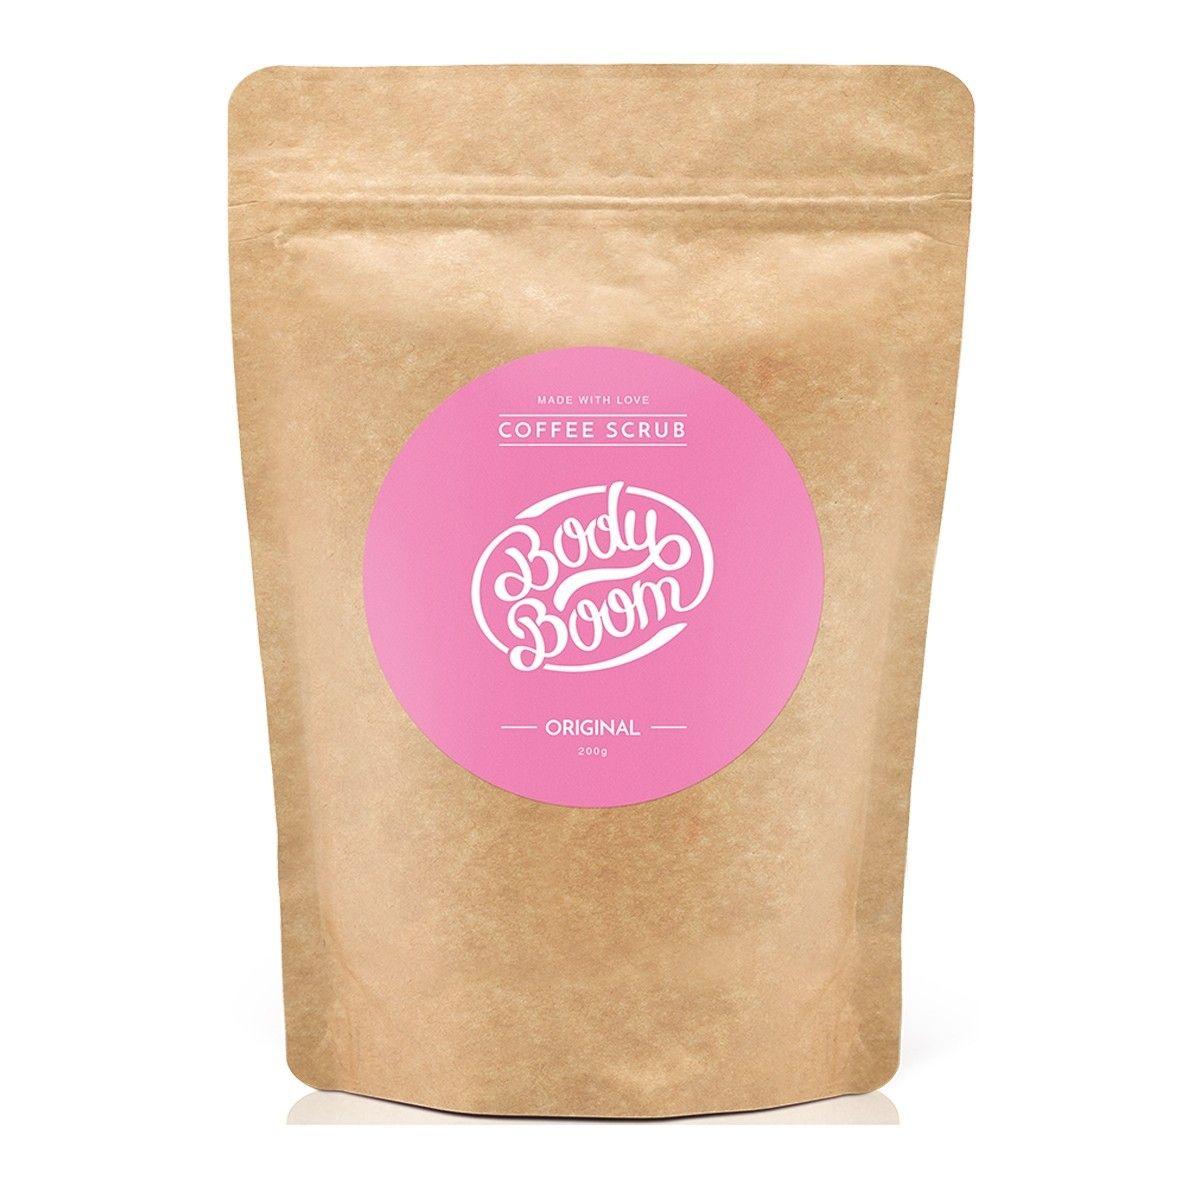 Afbeelding van Bodyboom Coffee Scrub Original/Chocolate Bodyscrub Beauty